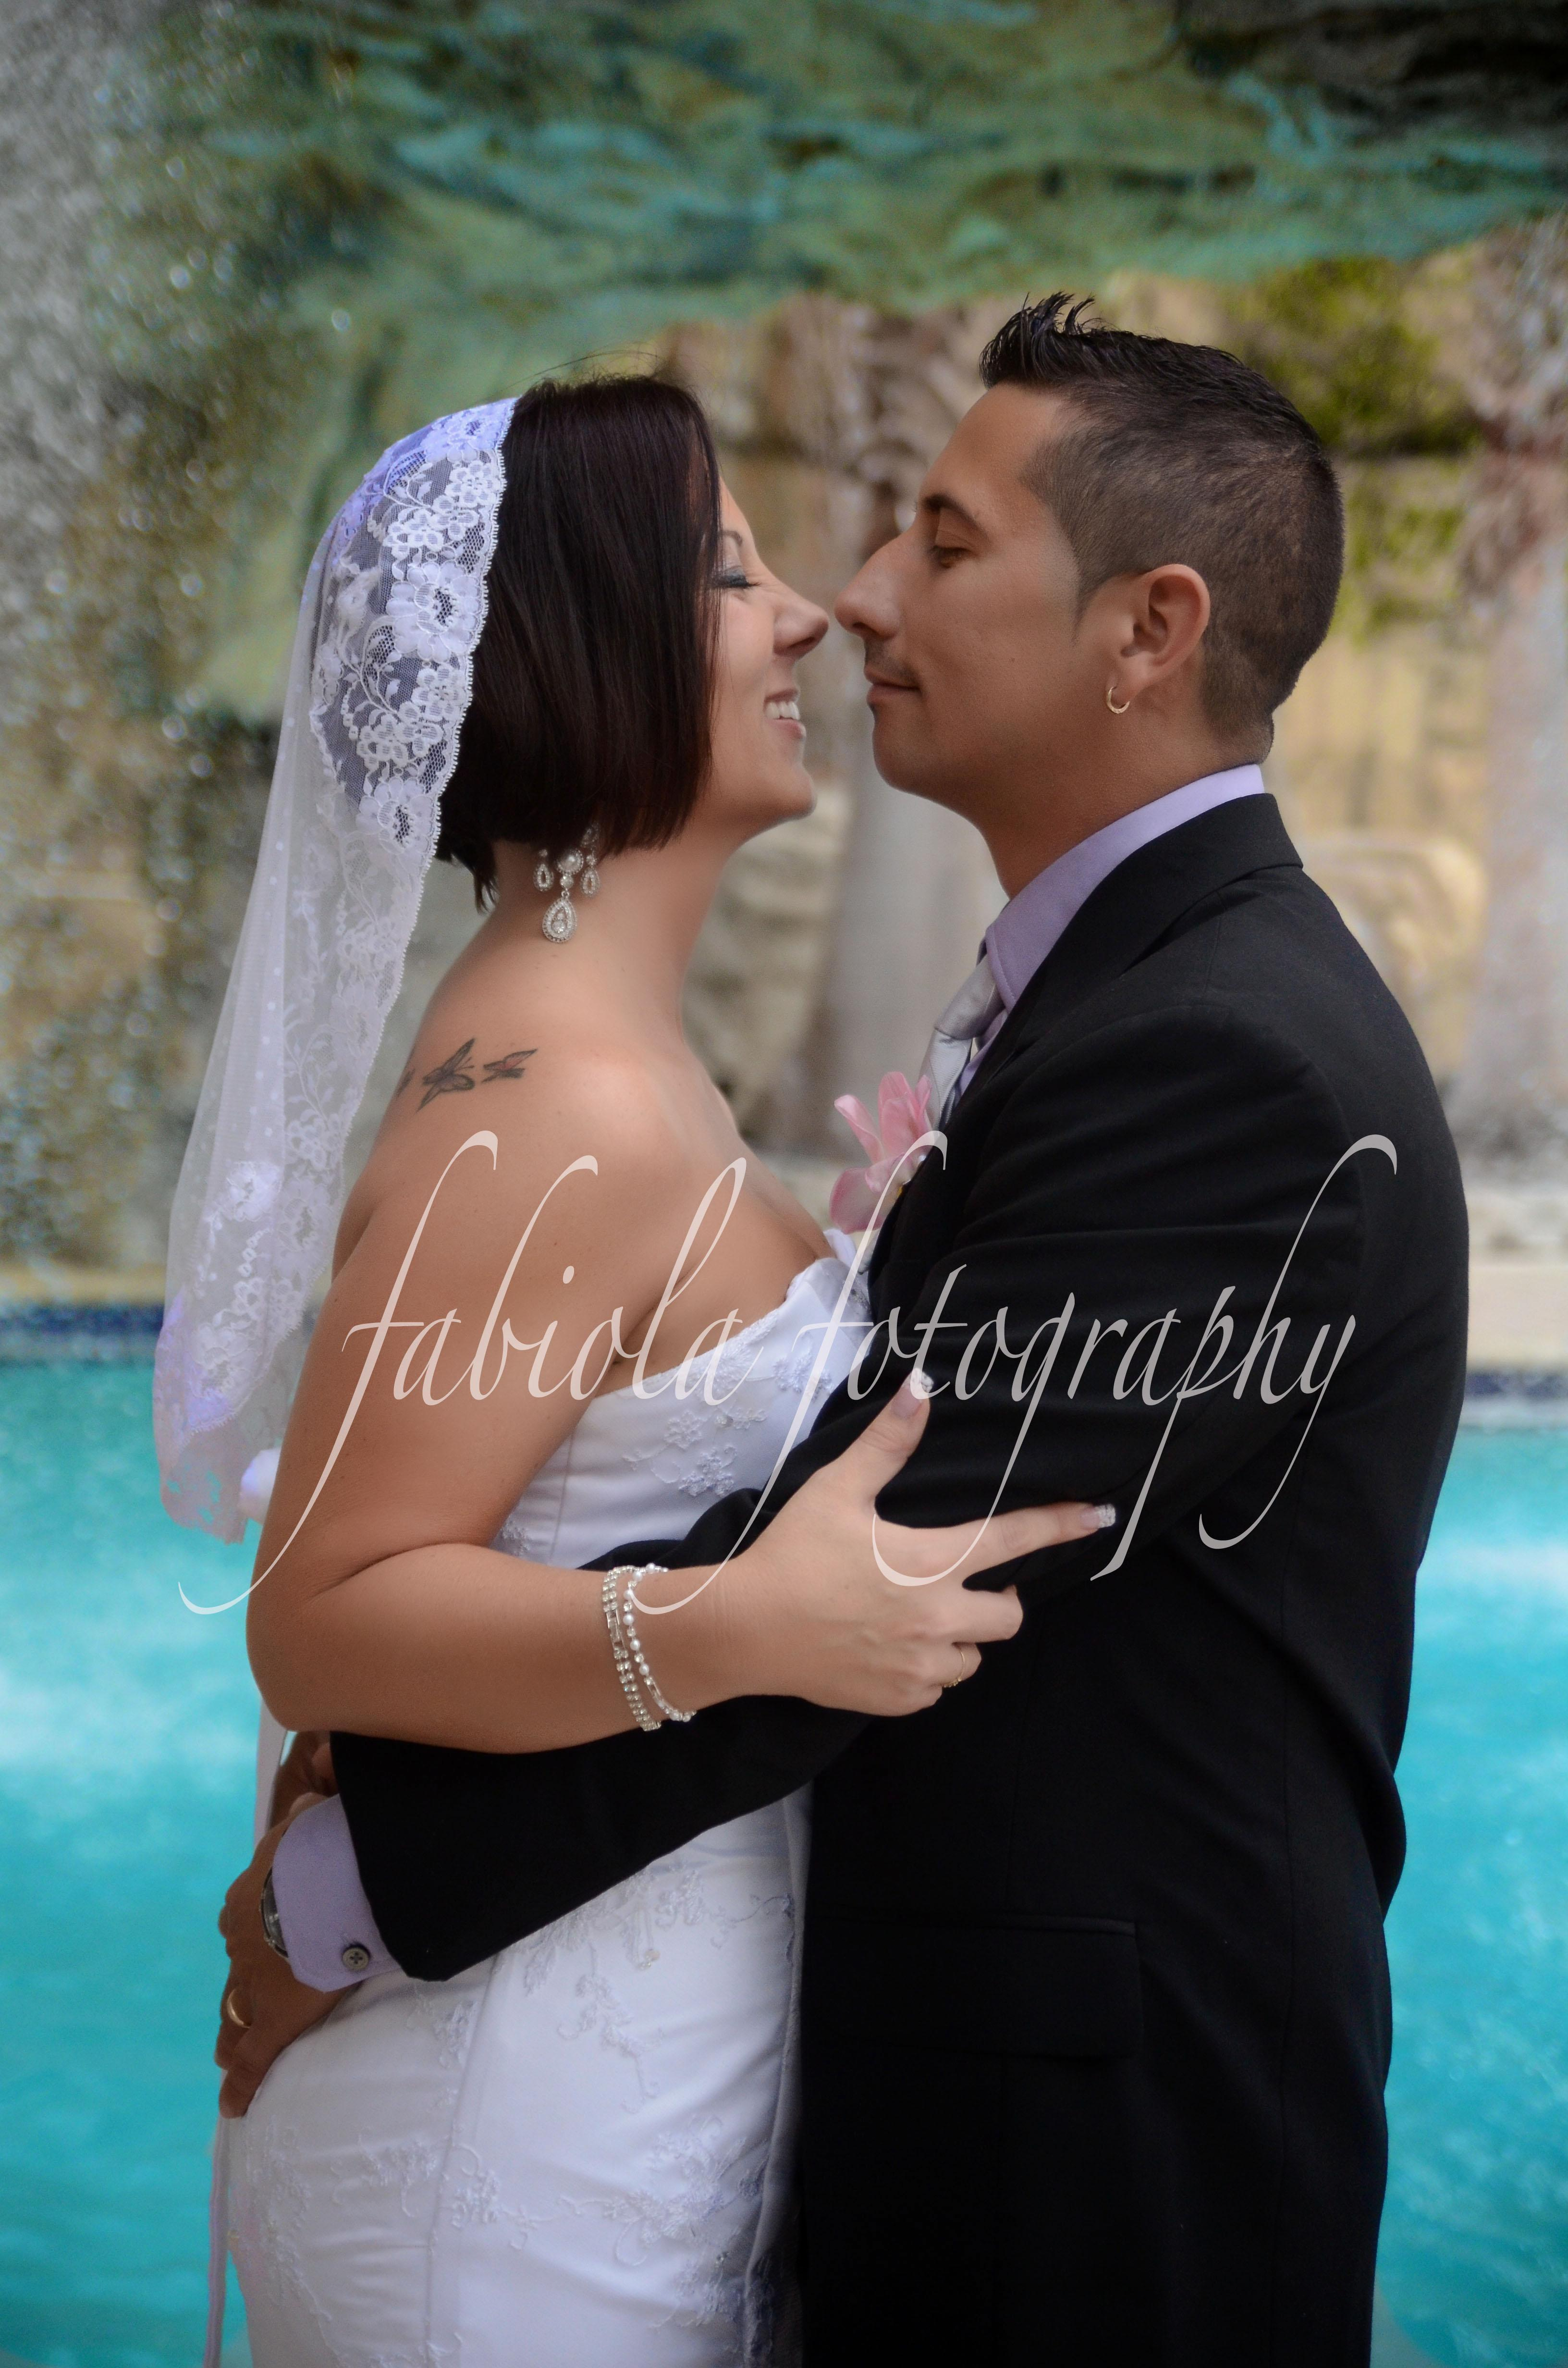 Fabiola Fotography image 7